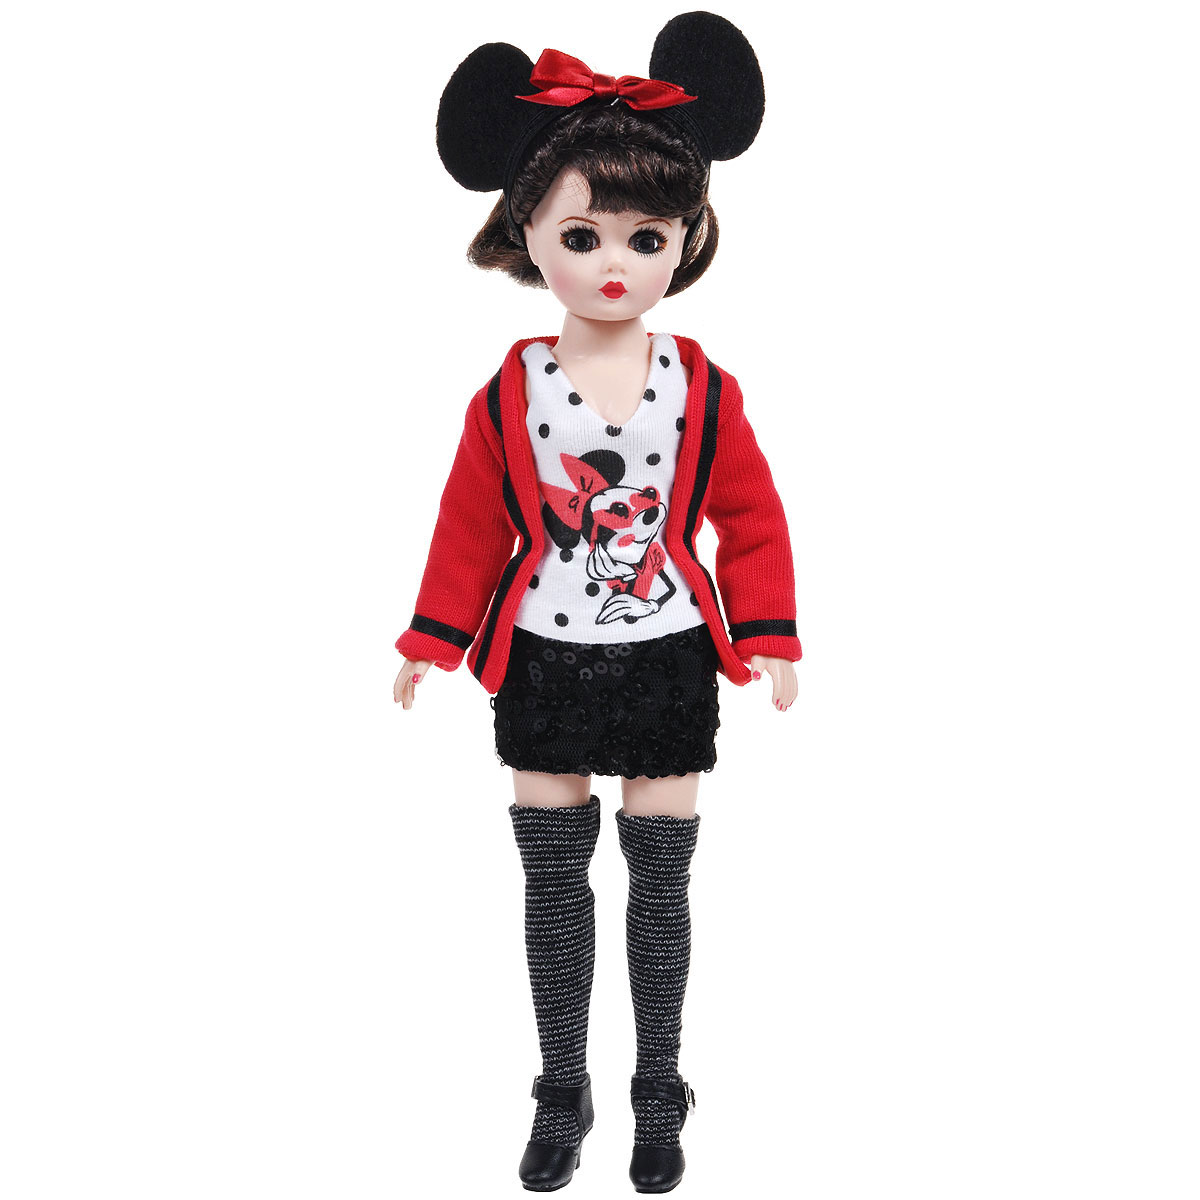 Madame Alexander Кукла Минни madame alexander кукла мэгги почтальон